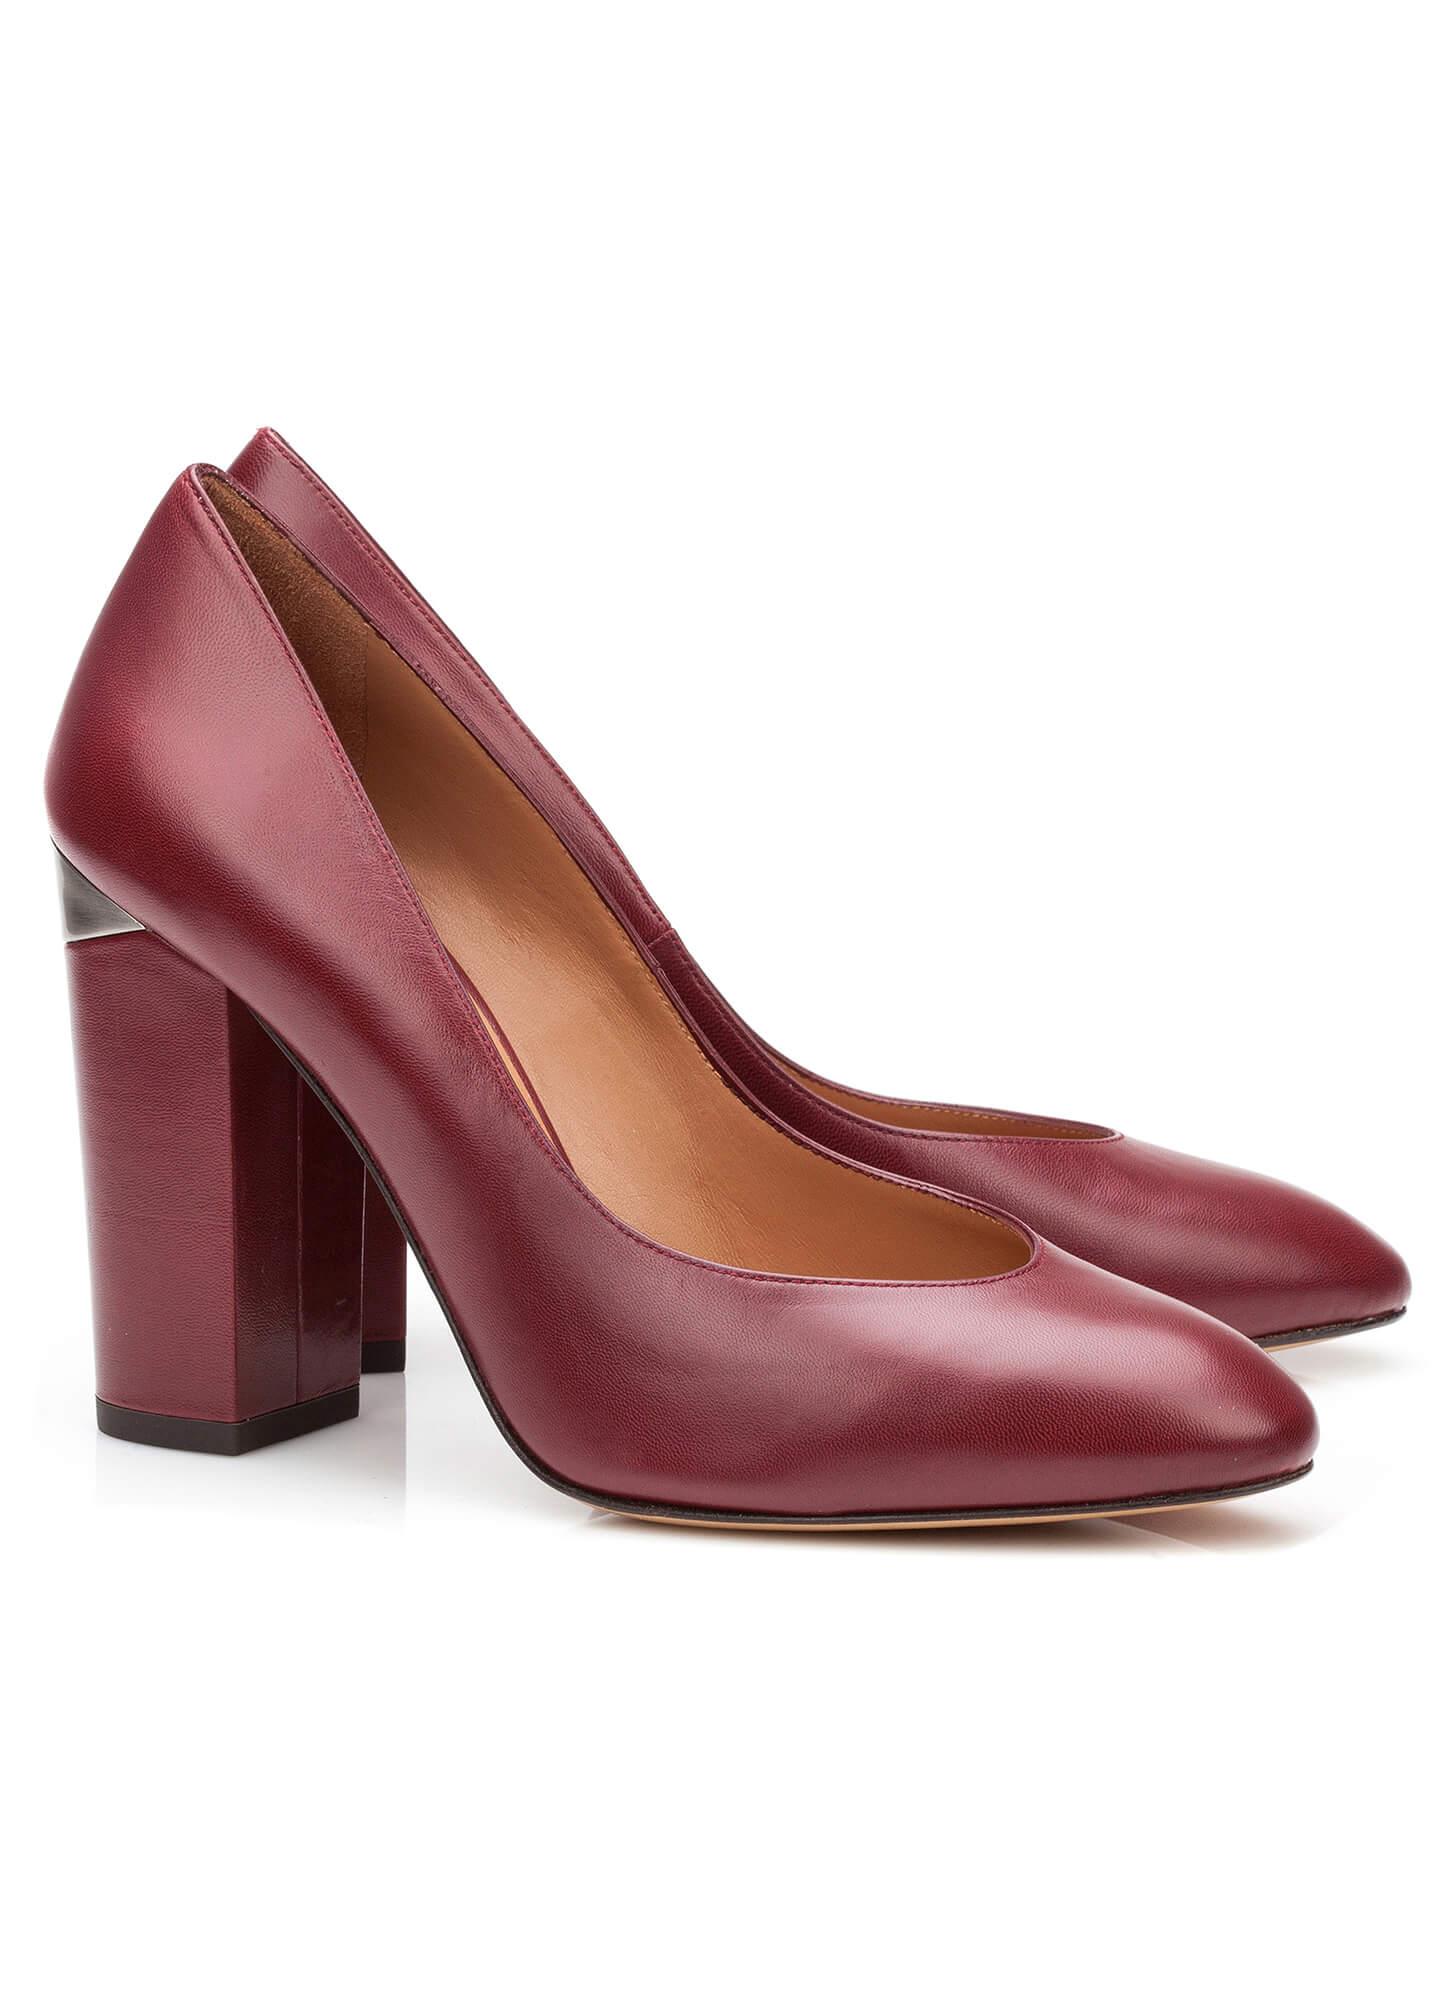 db8ff973e4 High heel pump in burgundy leather - online shoe store Pura Lopez ...